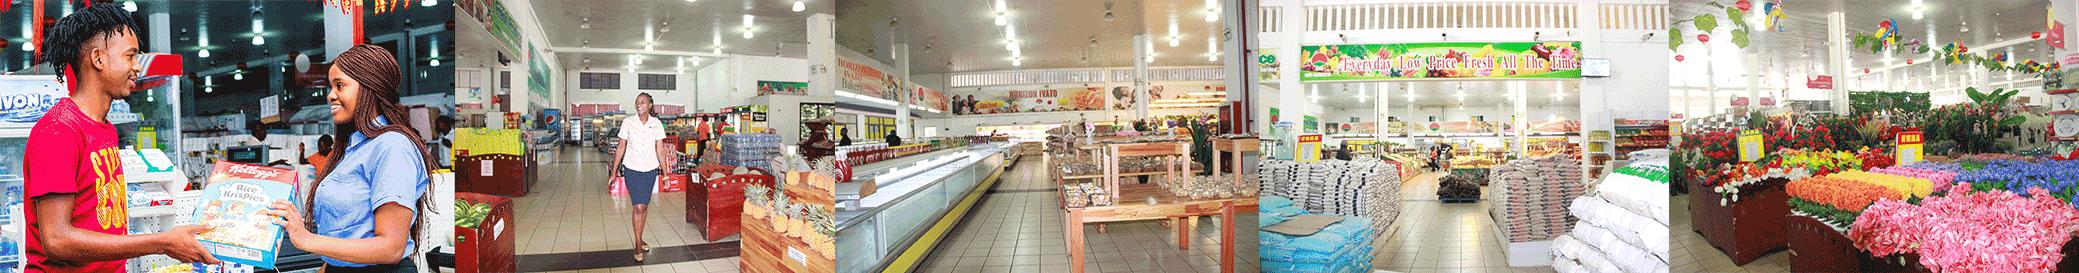 Furniture shops in harare - Ivato Supermarket